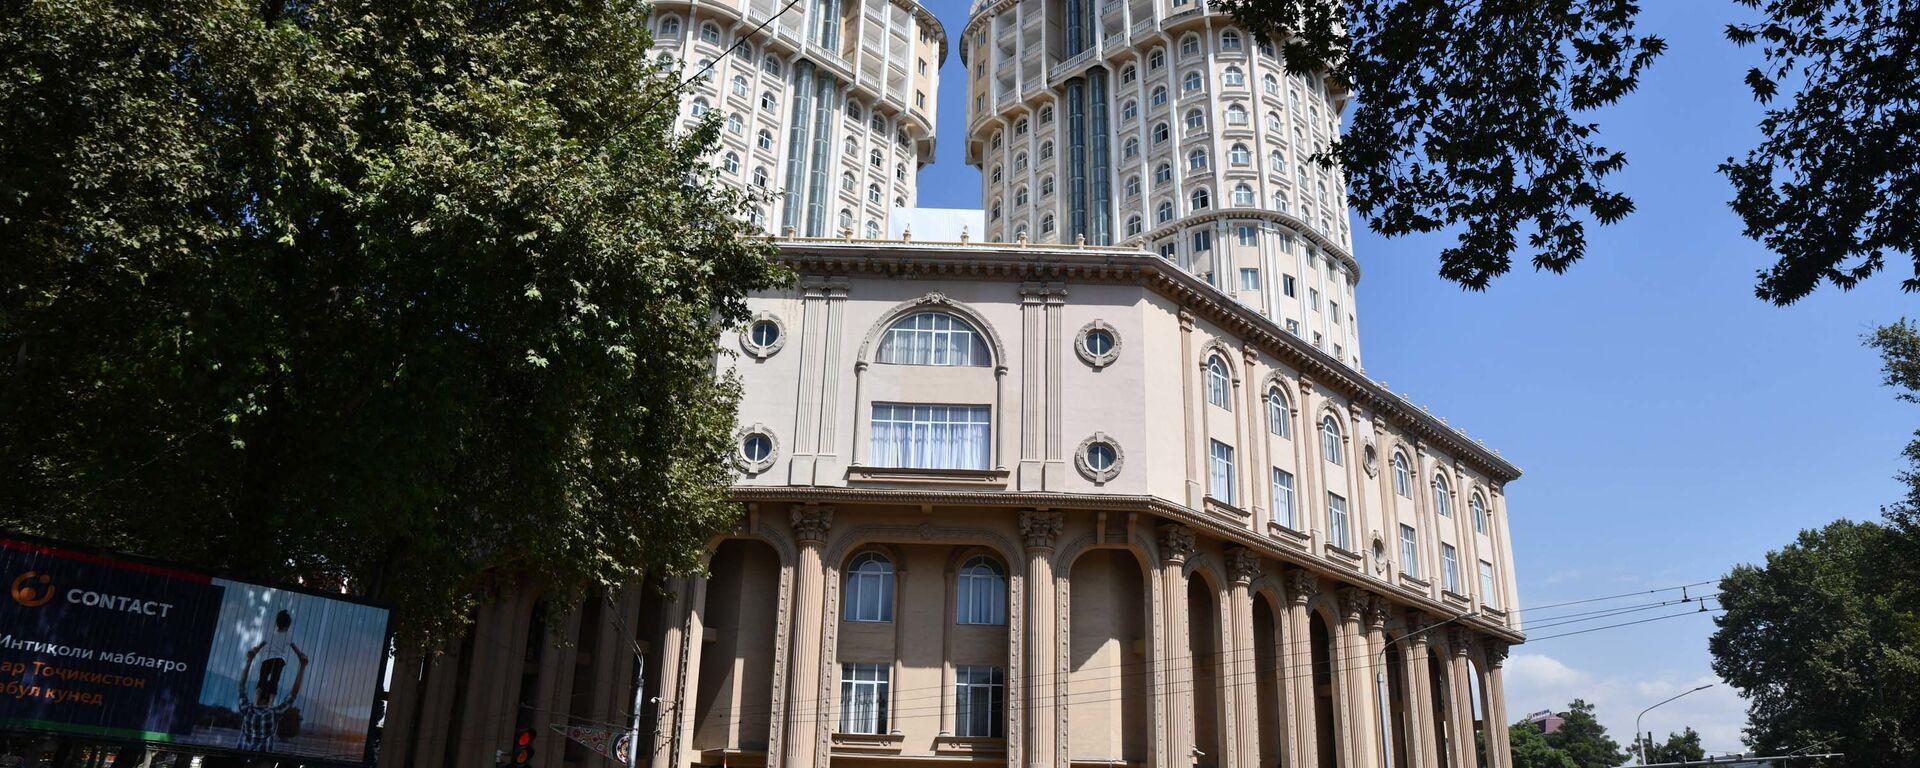 Душанбе плаза - Sputnik Тоҷикистон, 1920, 23.09.2021